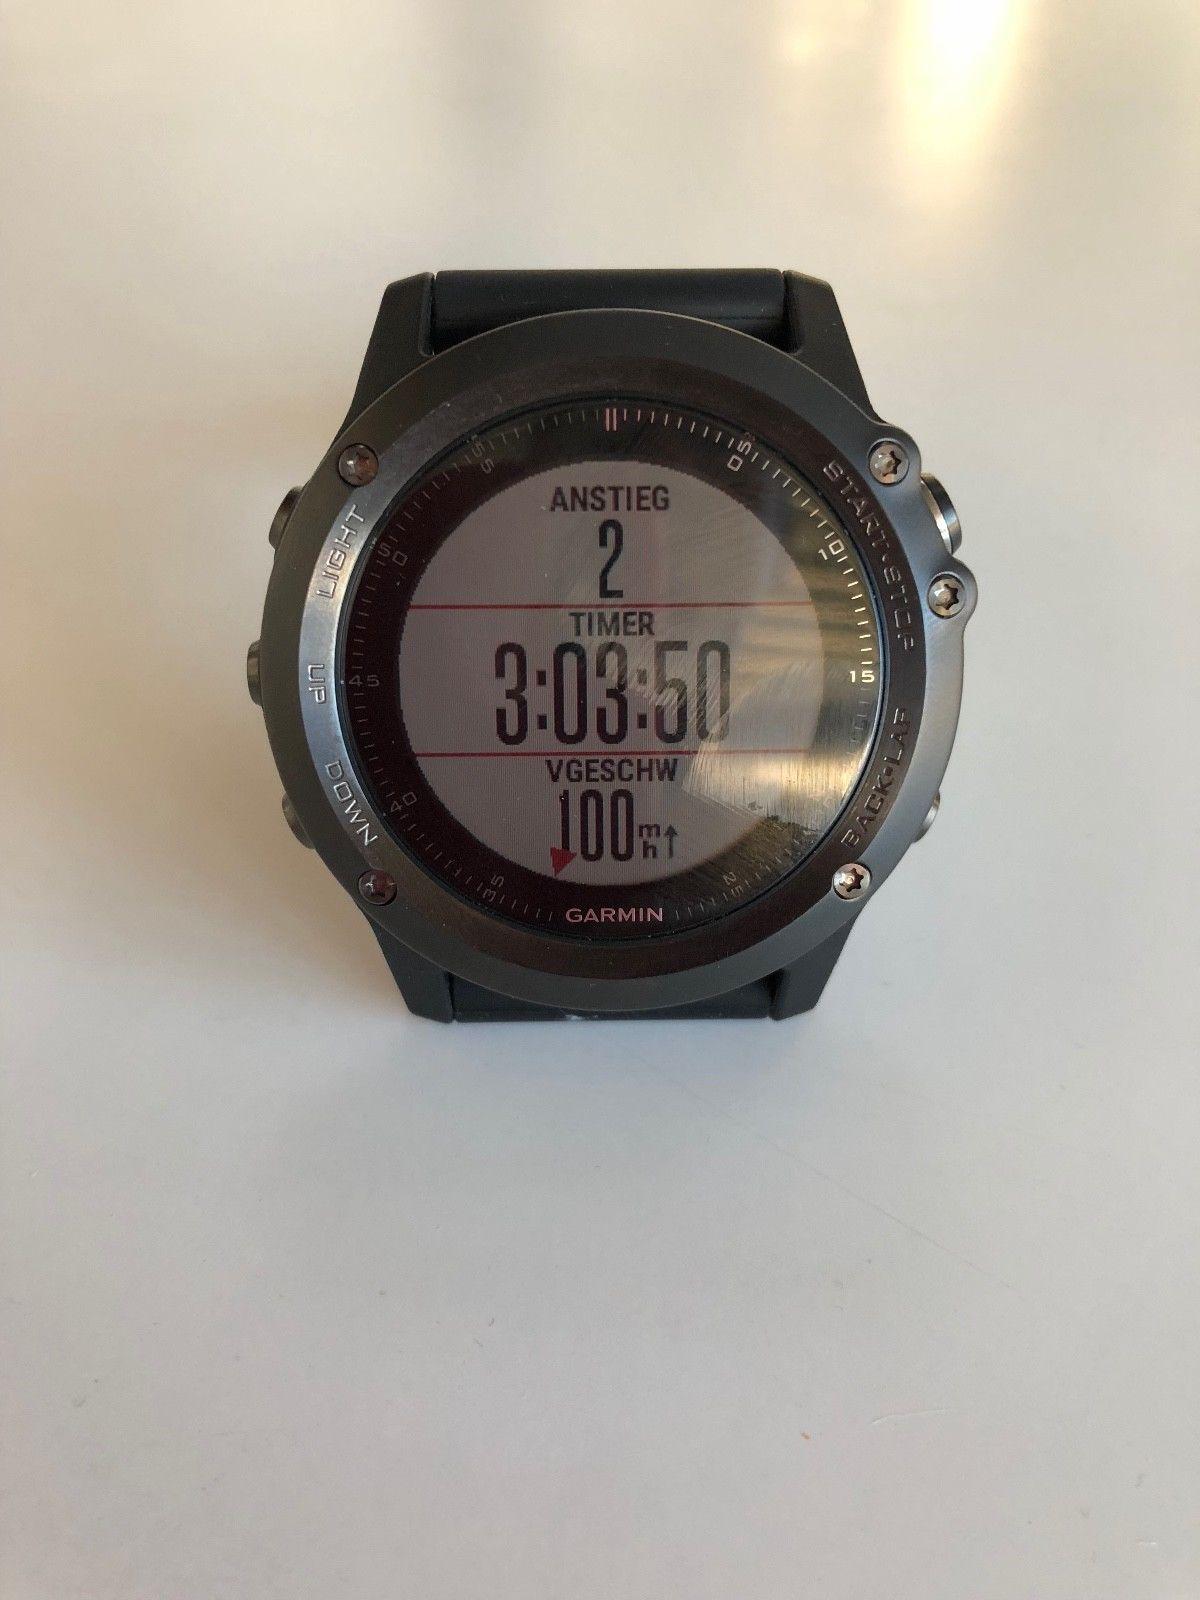 Garmin f?nix 3 Saphir HR 1,2 Zoll GPS-Multisportuhr mit Schwarzem Silikonarmband